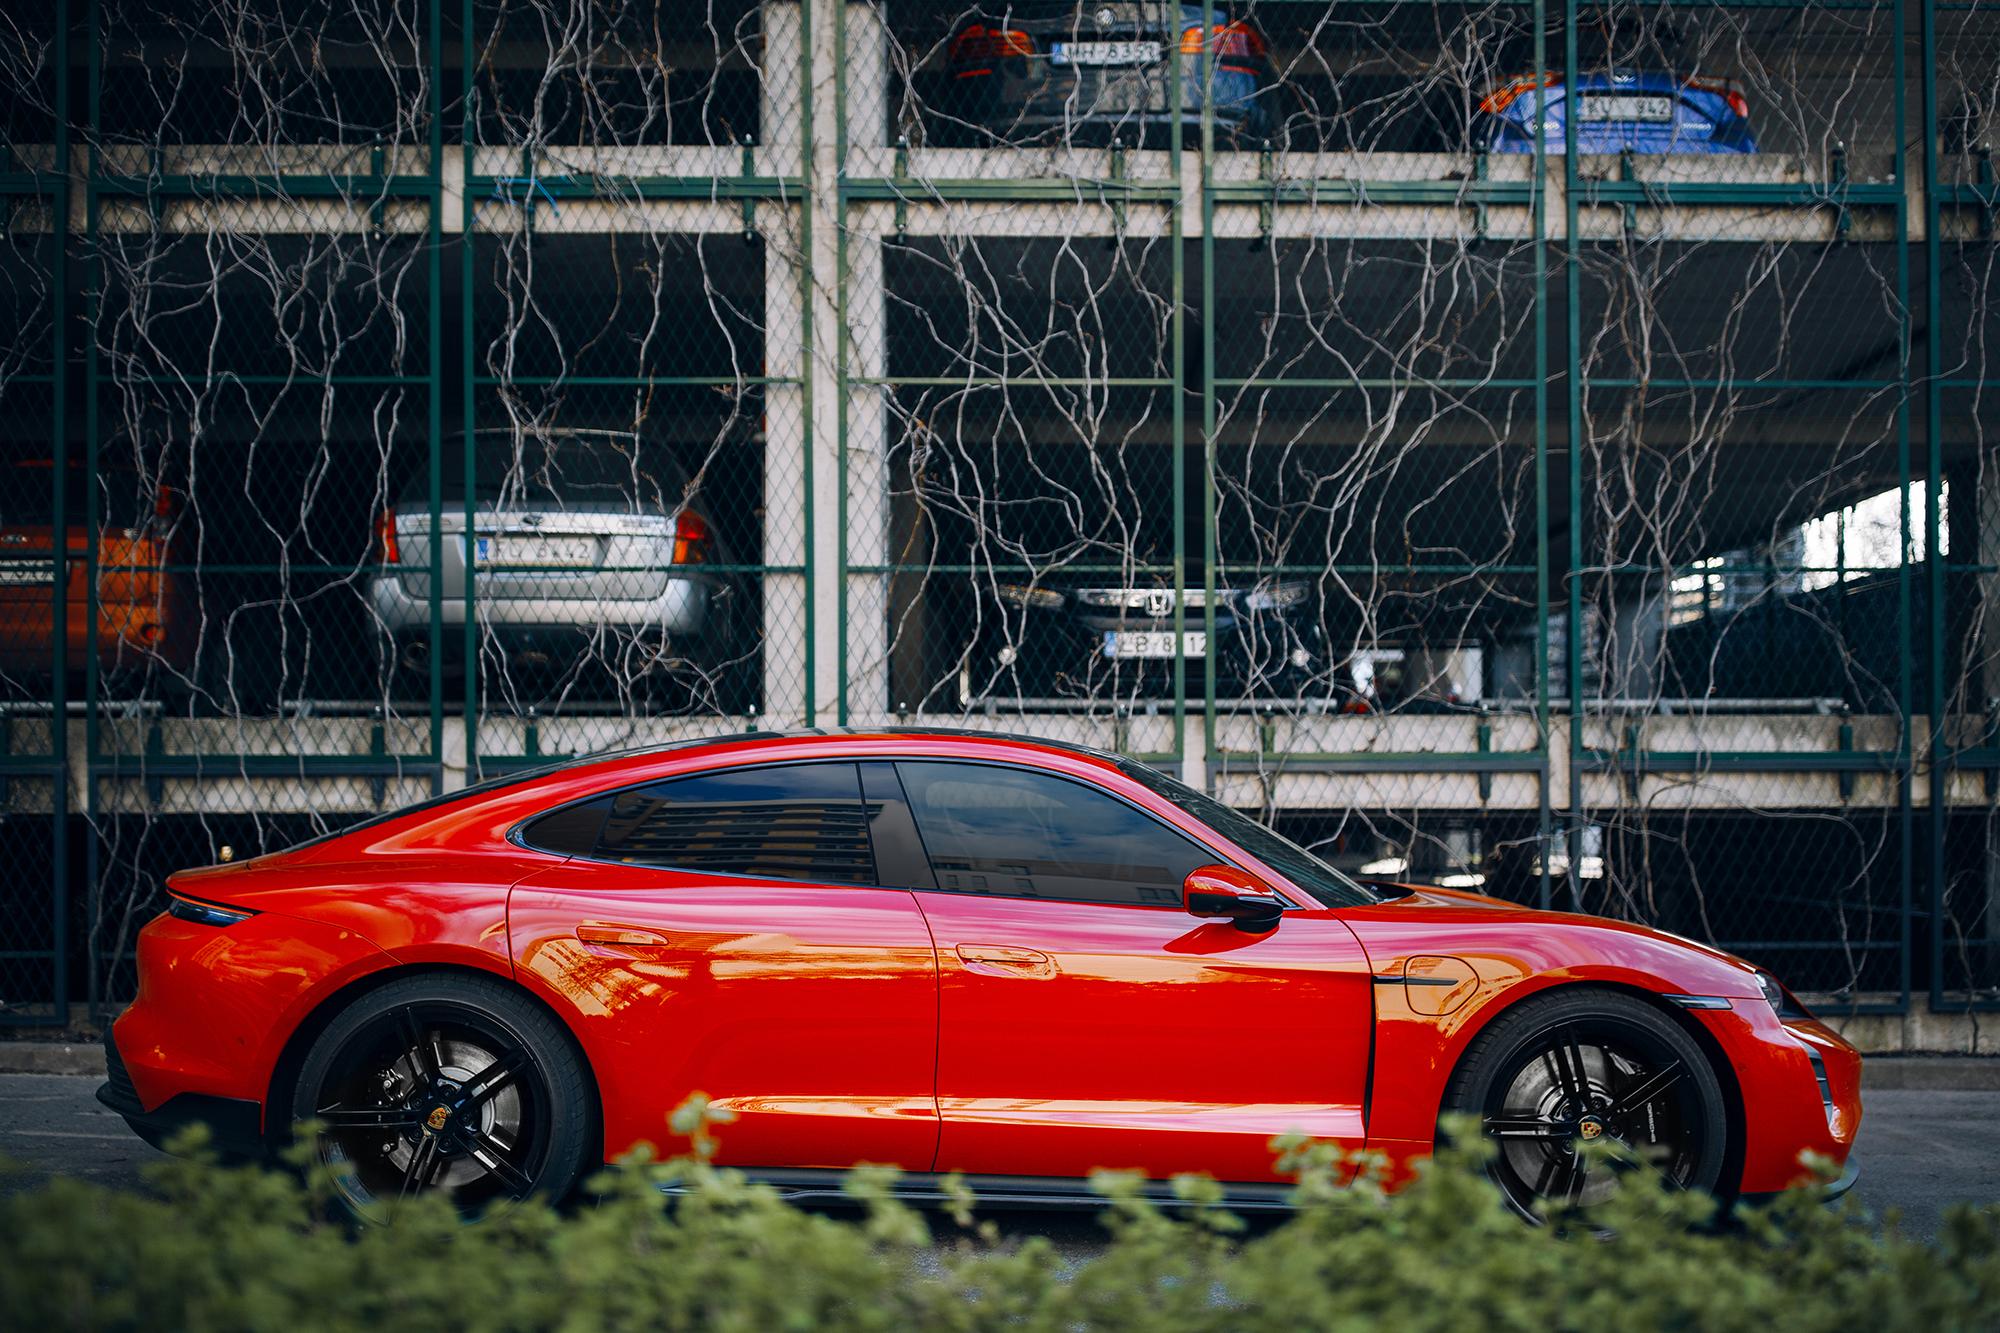 Porsche Taycan. (Image: BoJack/Shutterstock)